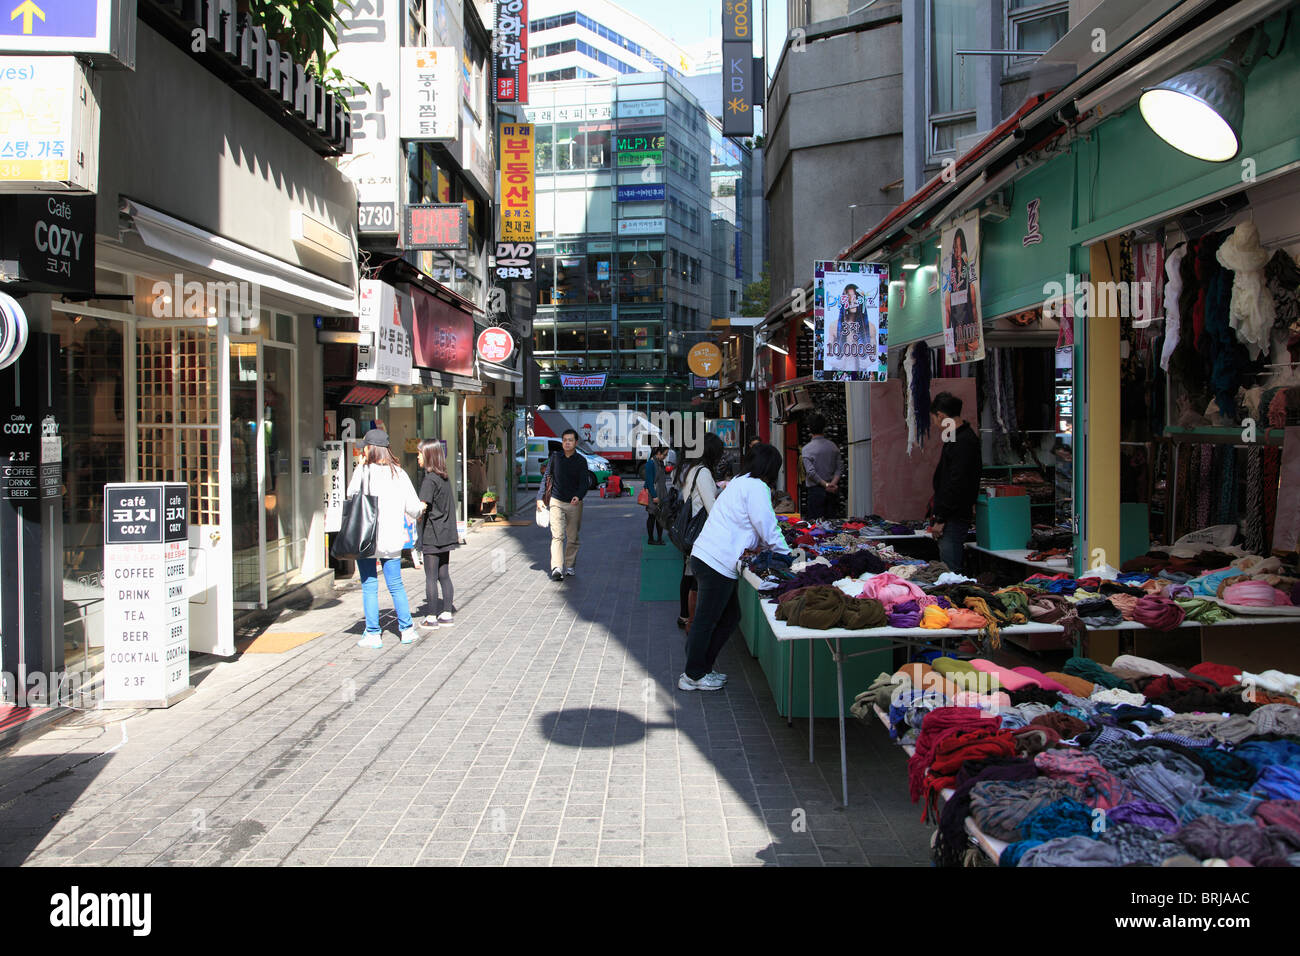 Myeong-dong, Myeongdong, Seoul, South Korea, Asia - Stock Image